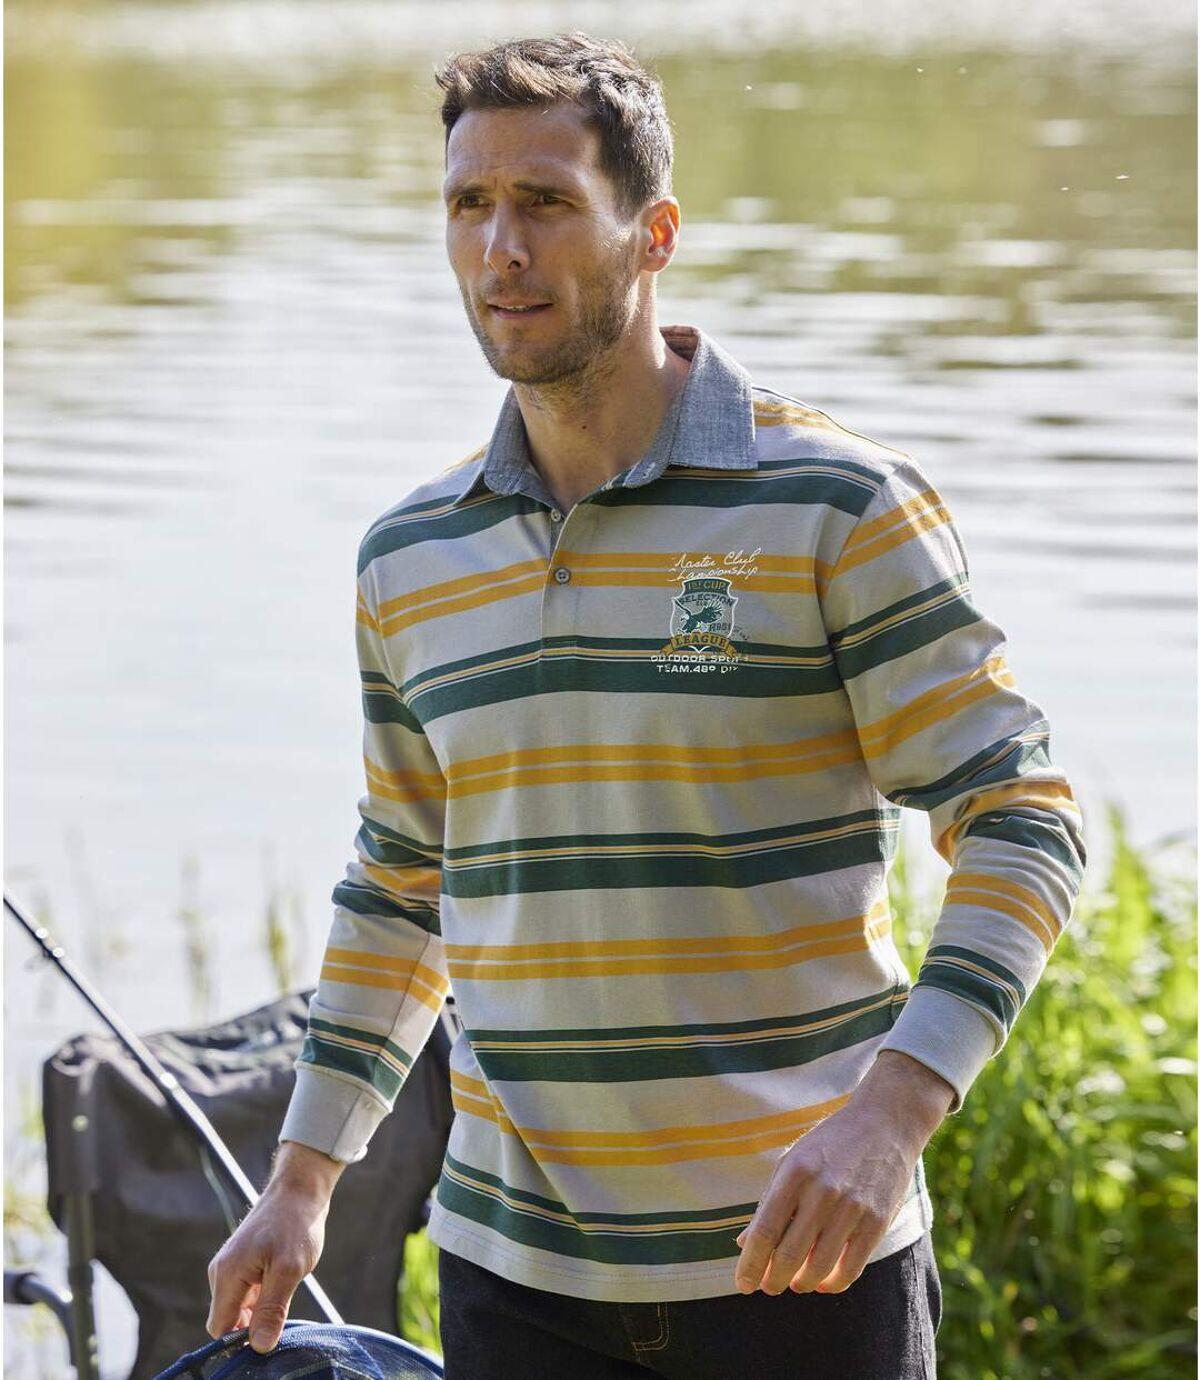 Men's Striped Long-Sleeved Polo Shirt - Grey Green Yellow Atlas For Men